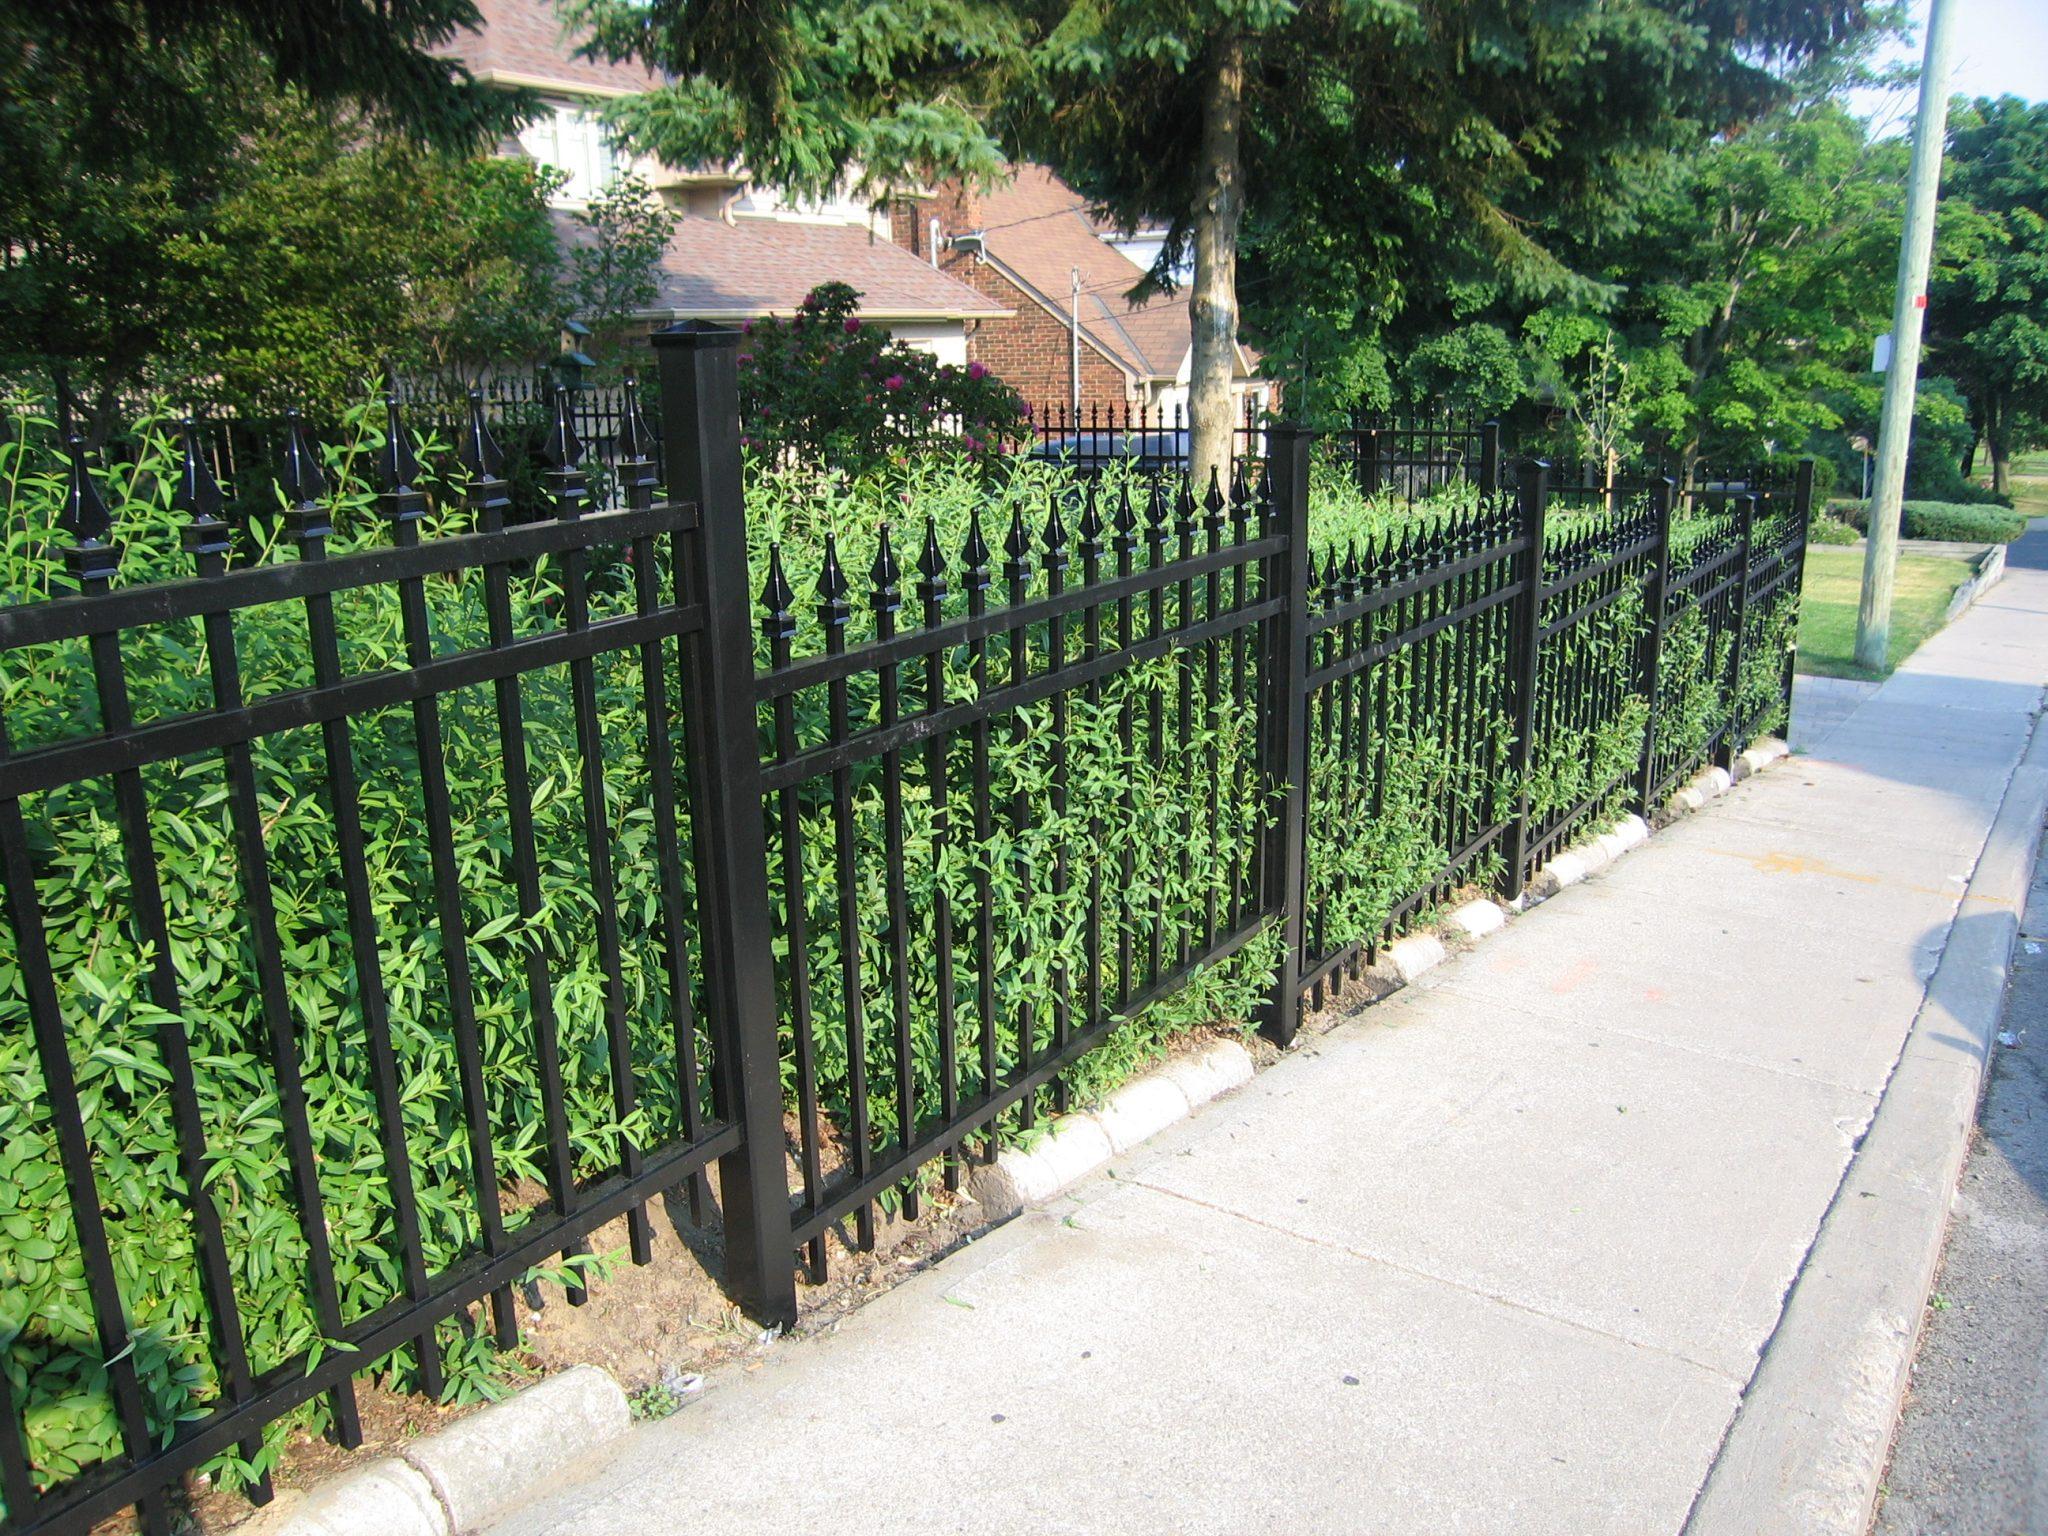 Declining picket fence